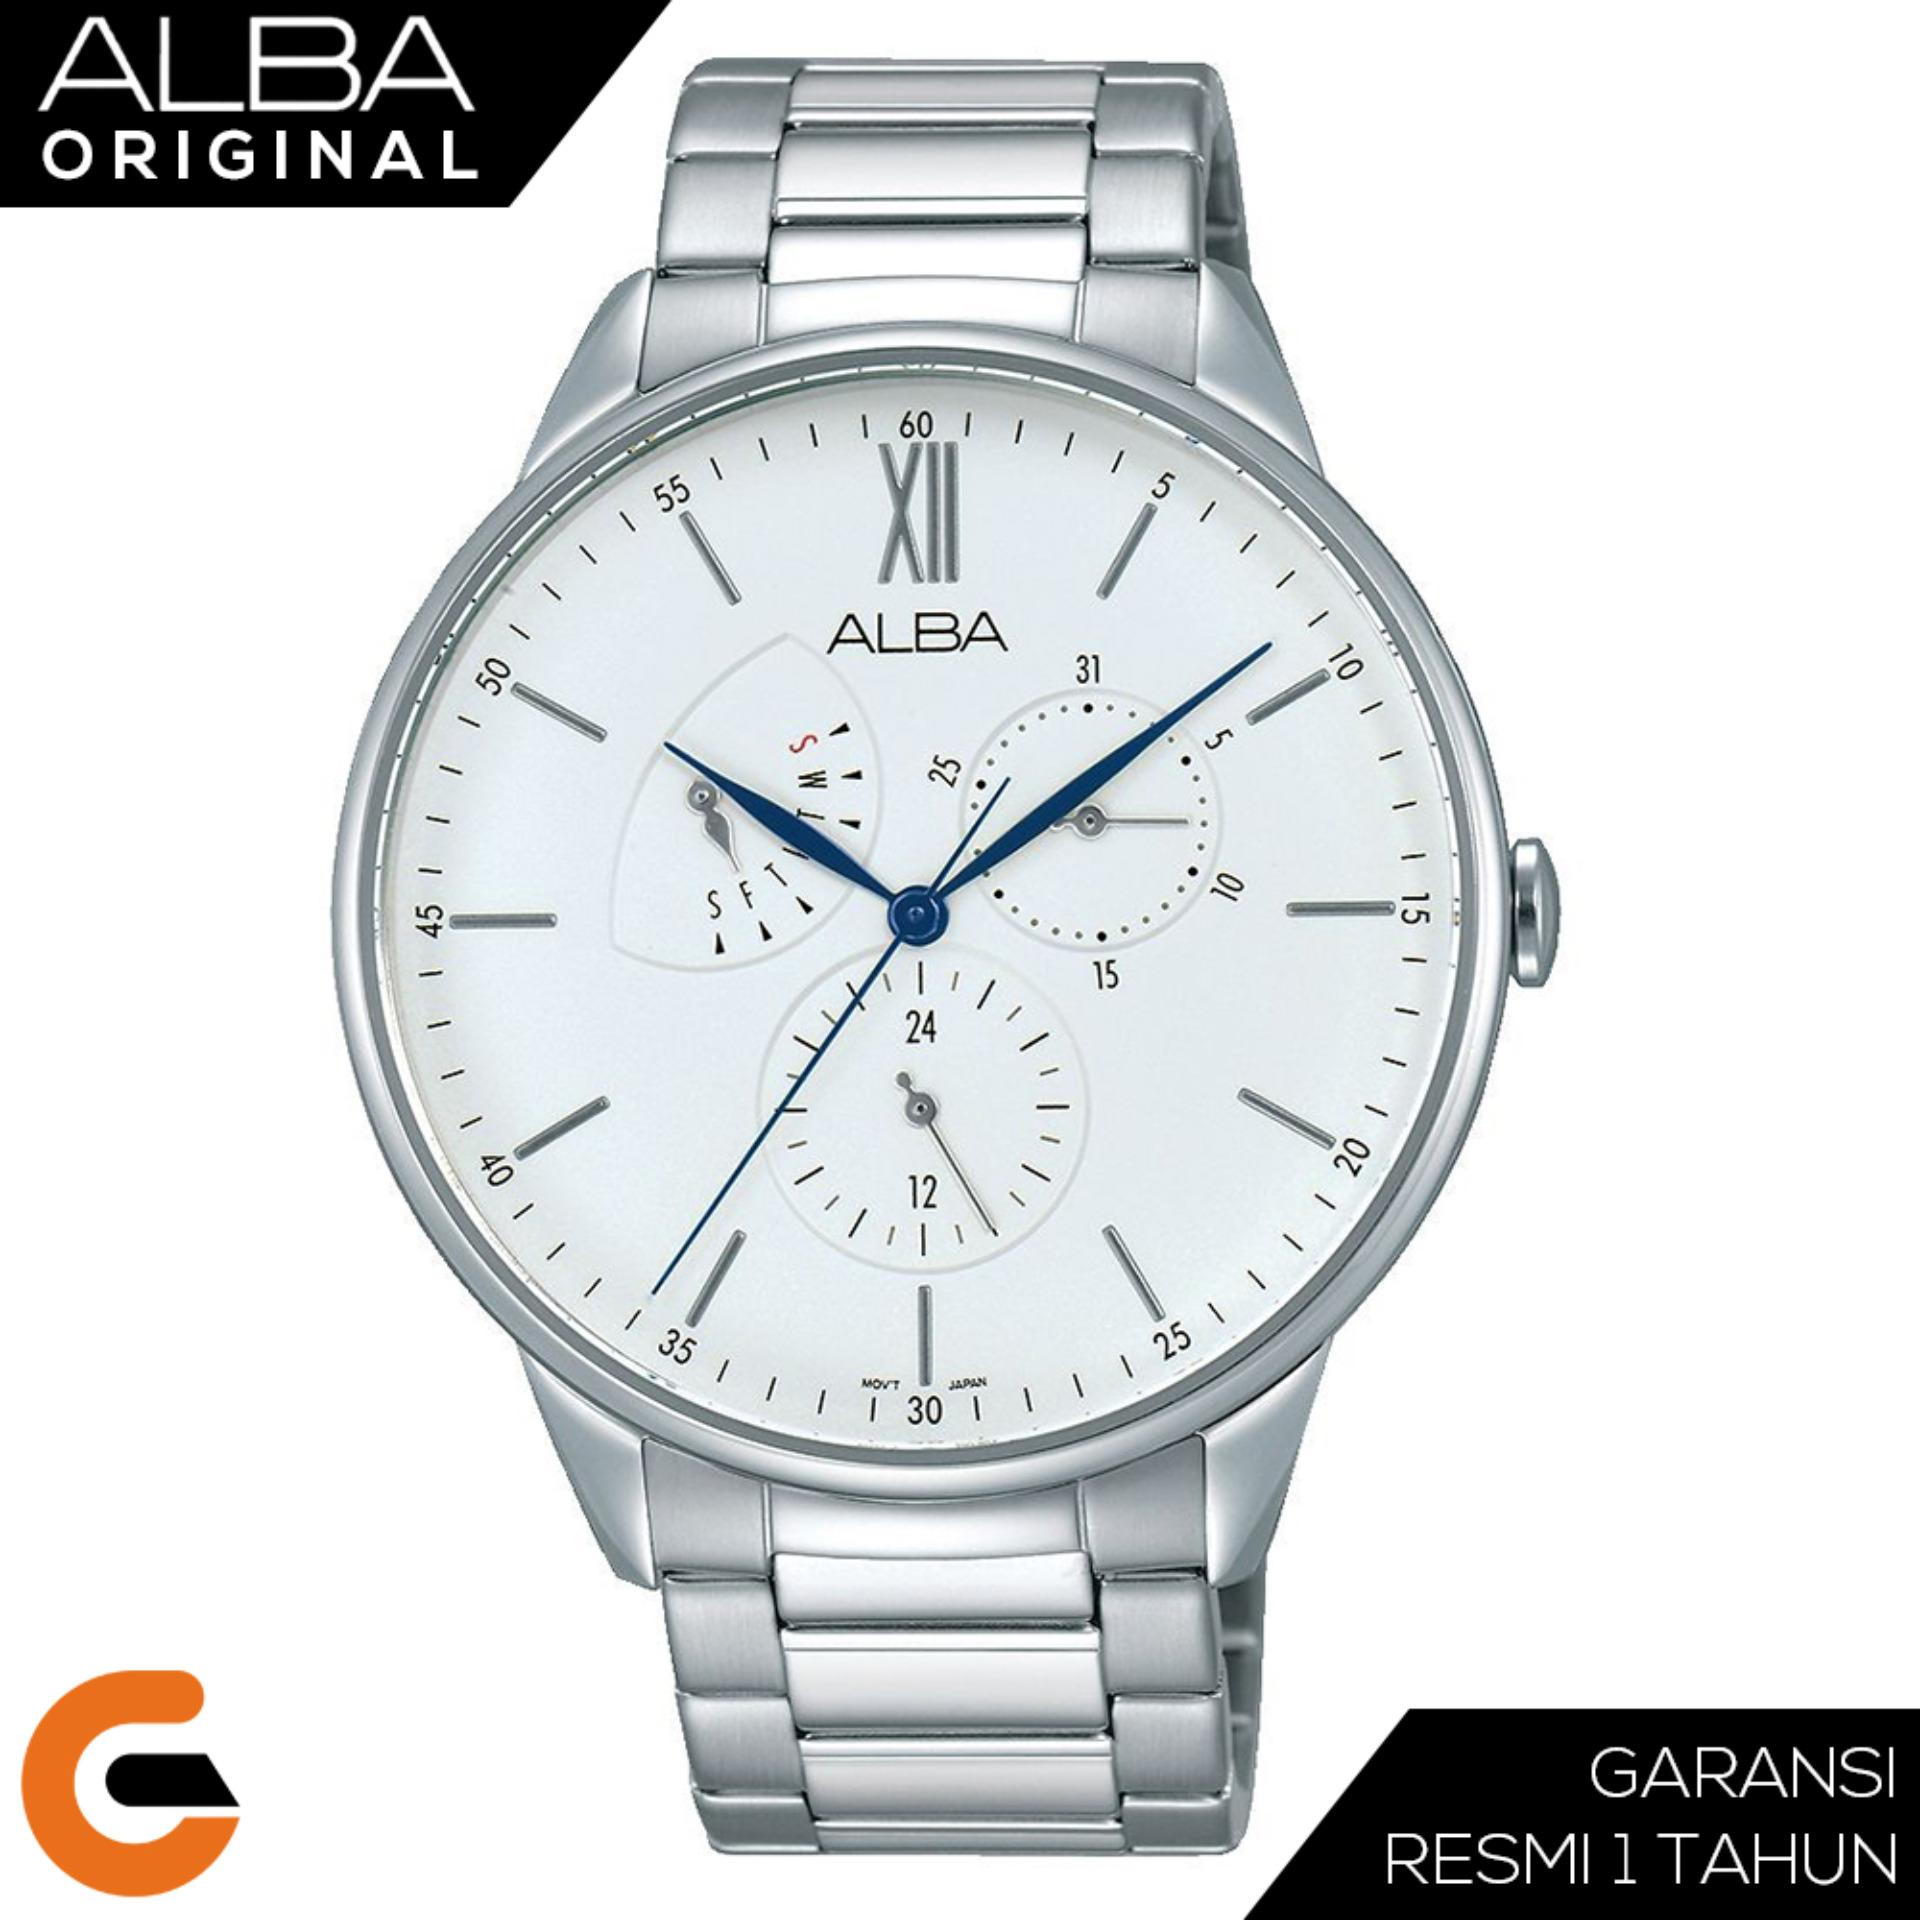 ALBA Chronograph Jam Tangan Pria Tali Stainless Steel Quartz Movement AZ800 Series